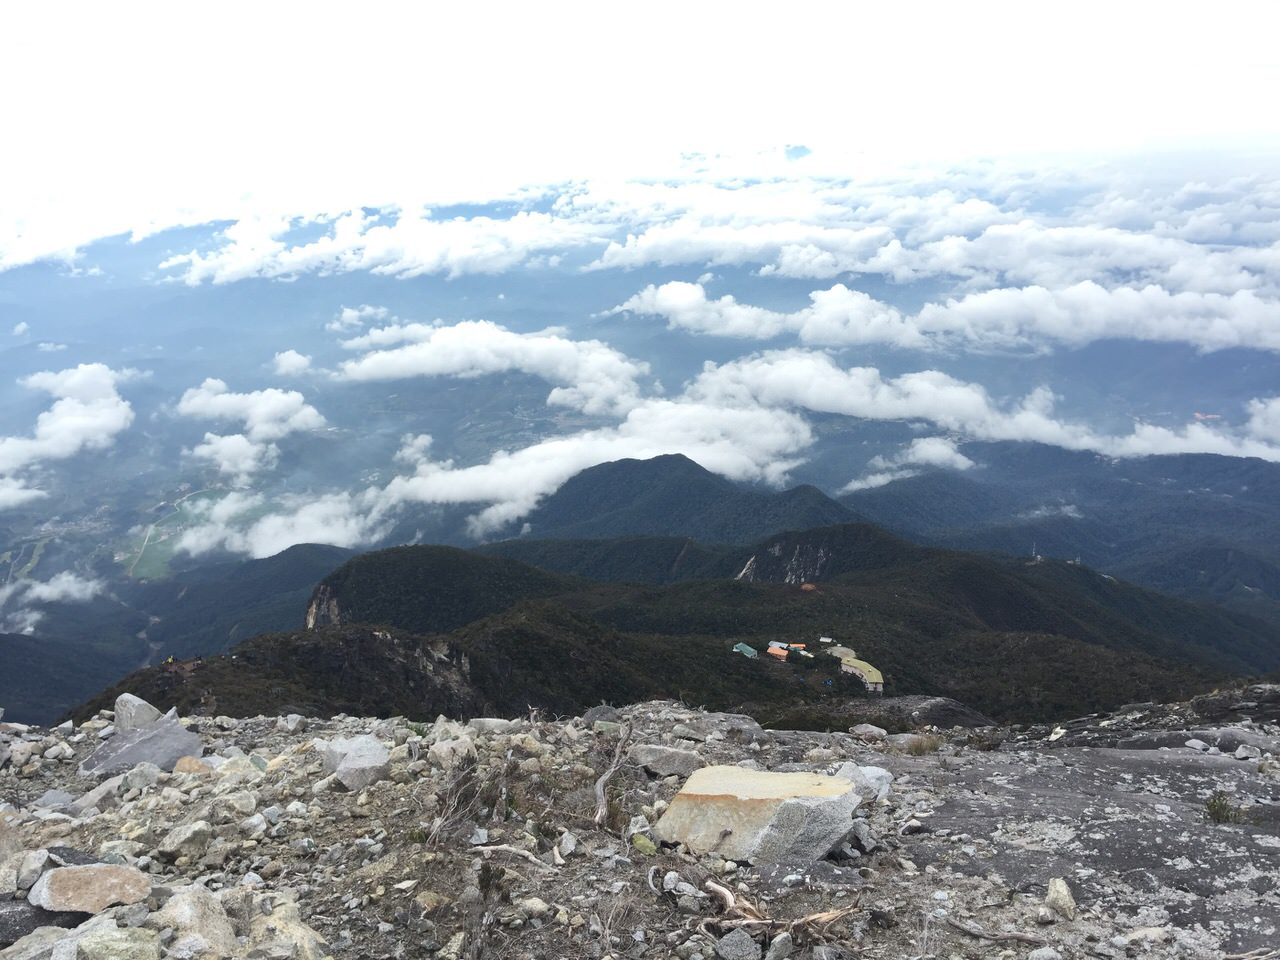 Kota Kinabalu climbing 4185